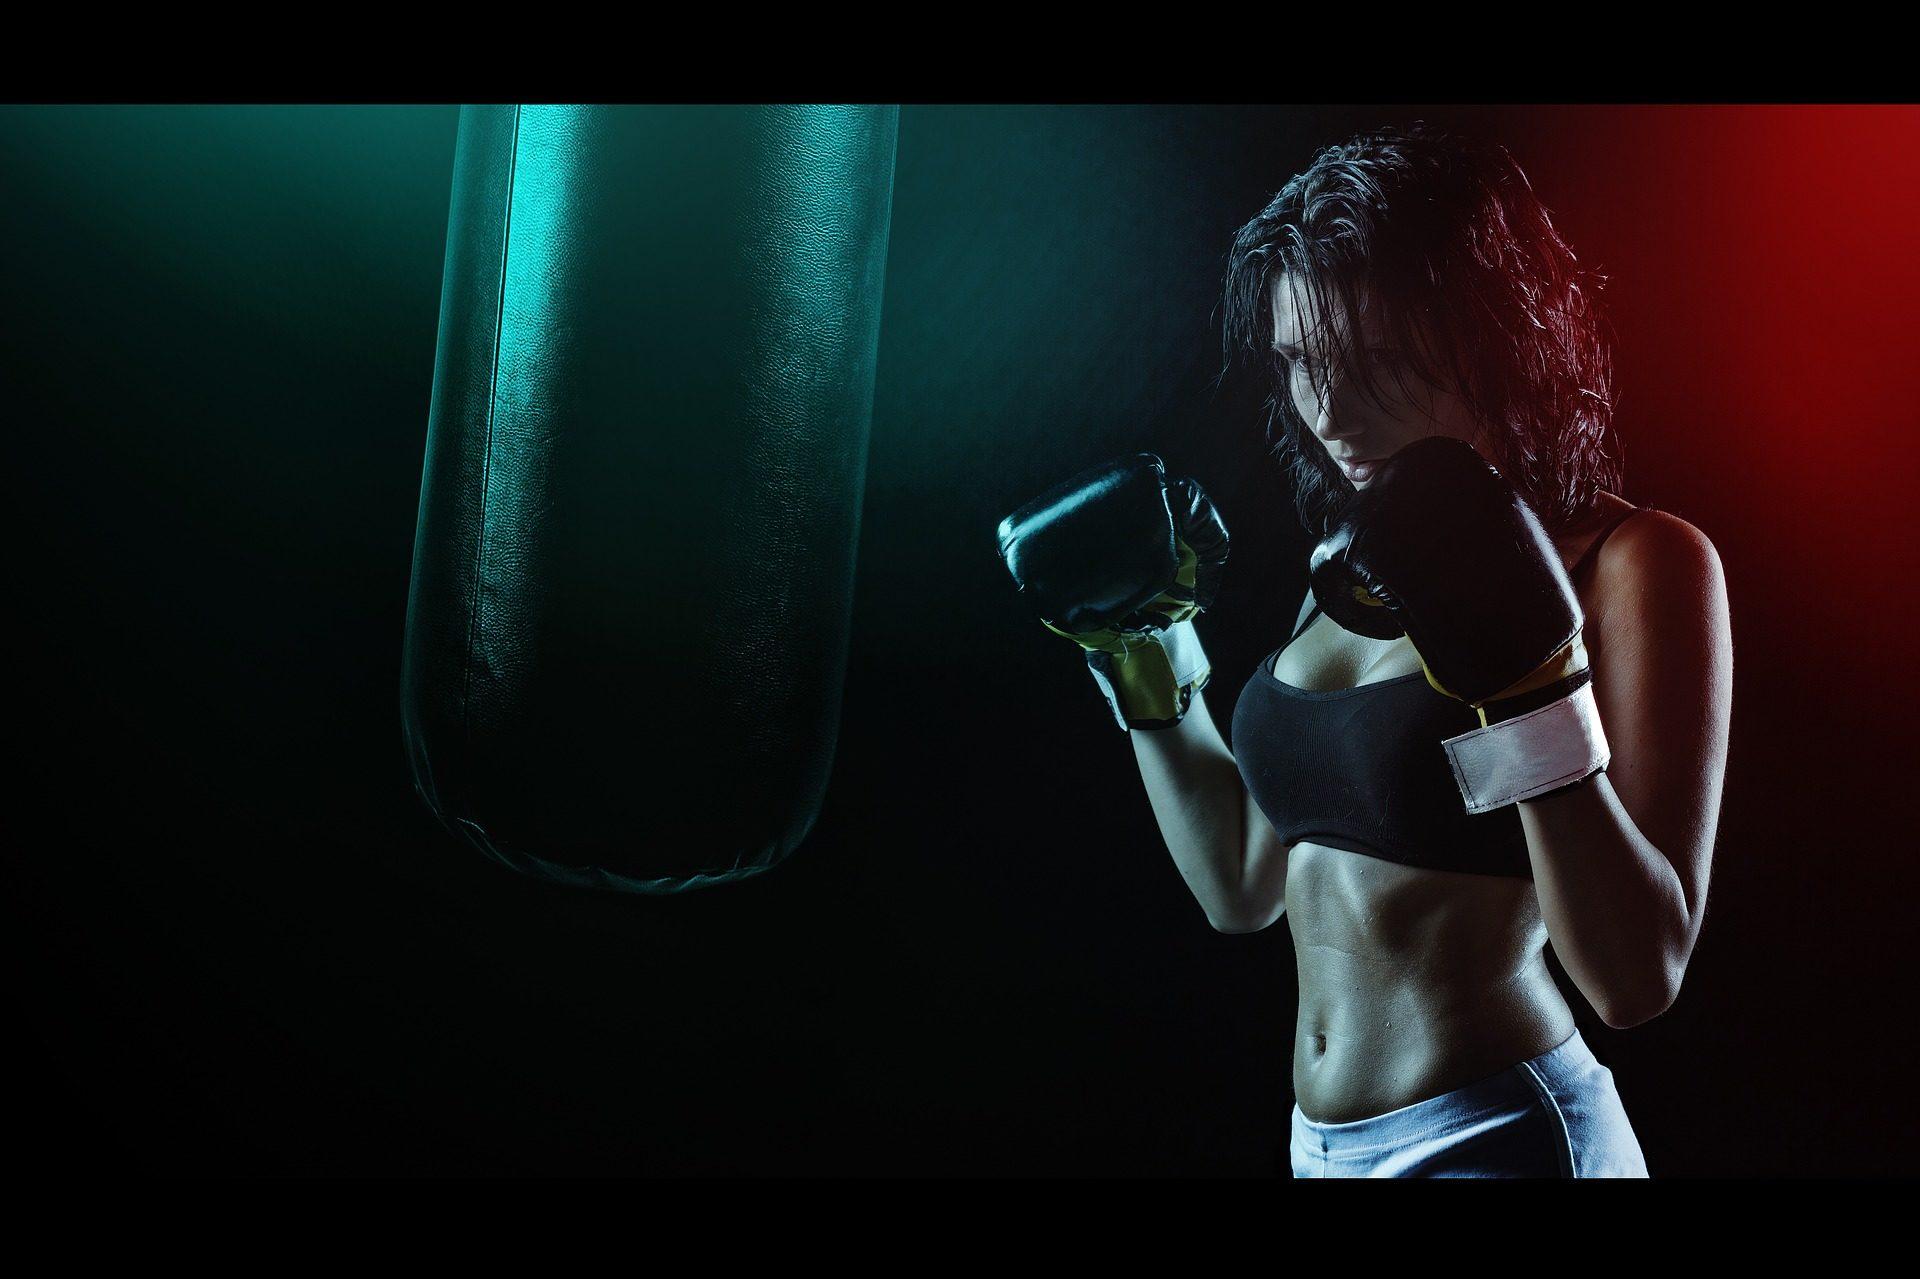 महिला, महिला बॉक्सर, मुक्केबाजी, दस्ताने, खेल, जुनून, प्रतियोगिता - HD वॉलपेपर - प्रोफेसर-falken.com